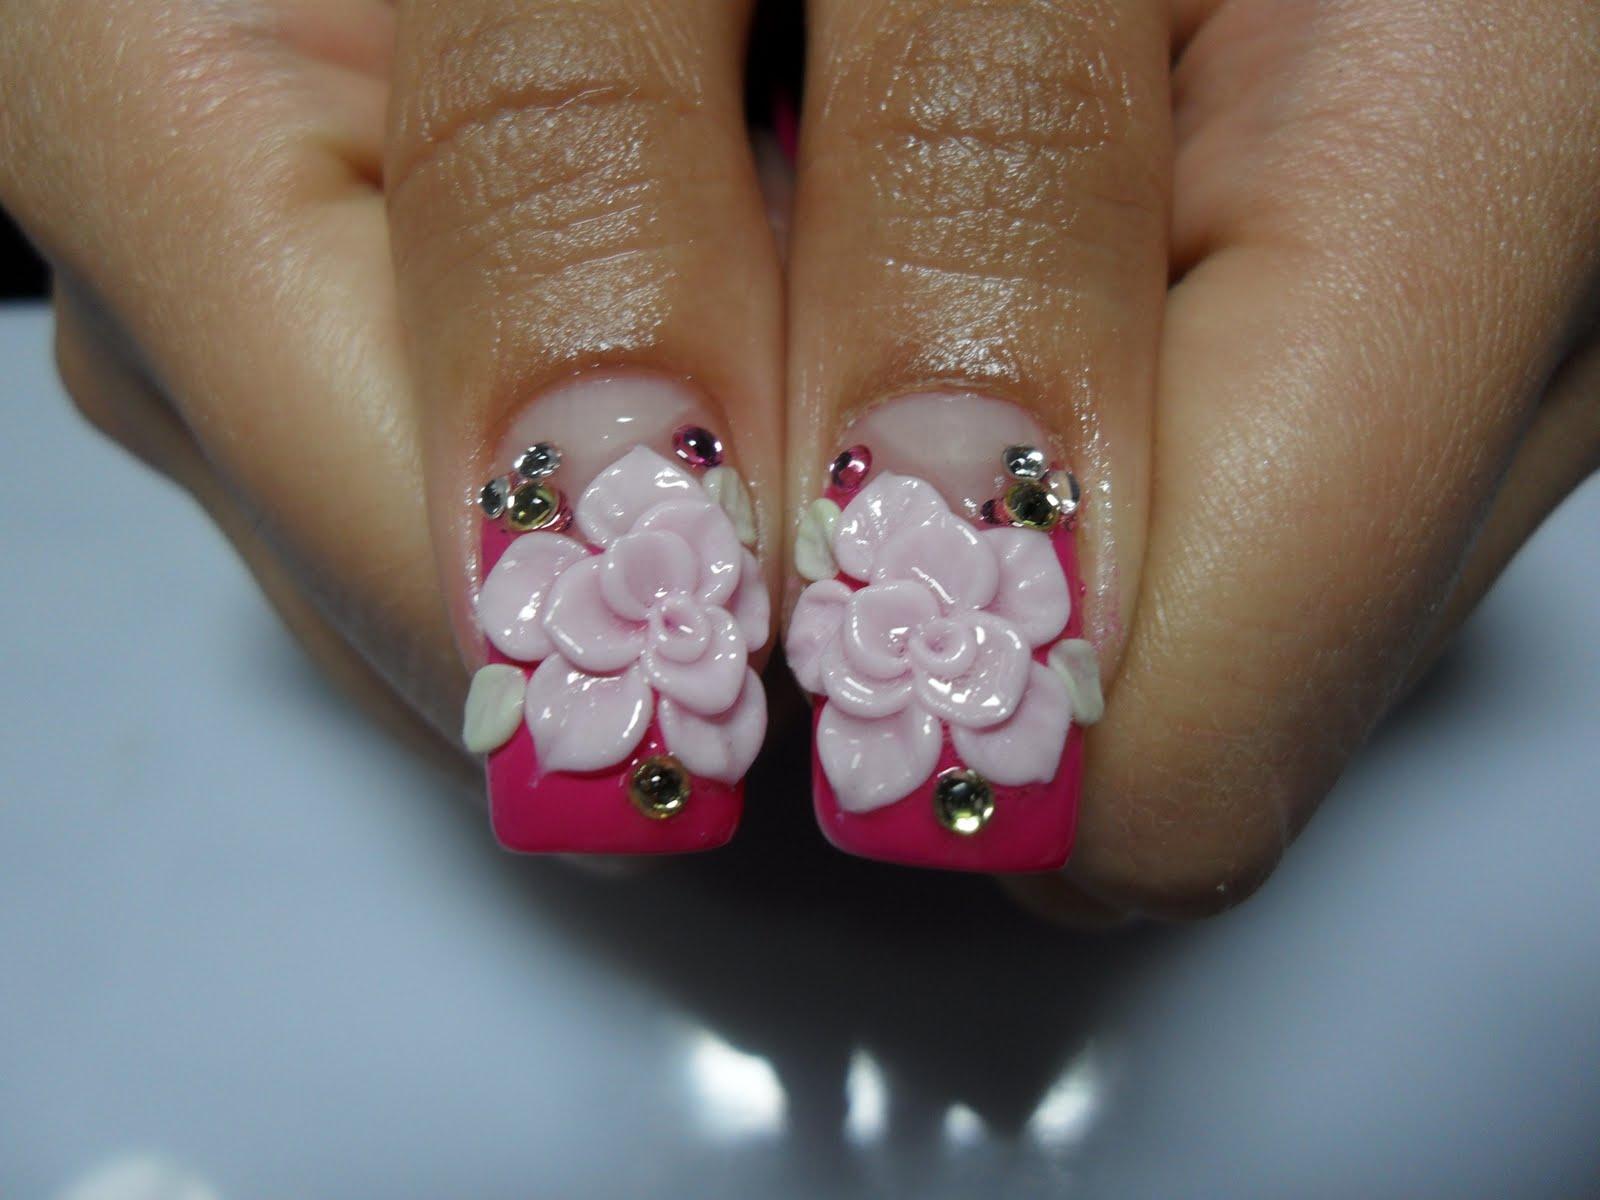 3d acrylic nails gel overlay by twinkel 3d acrylic nails